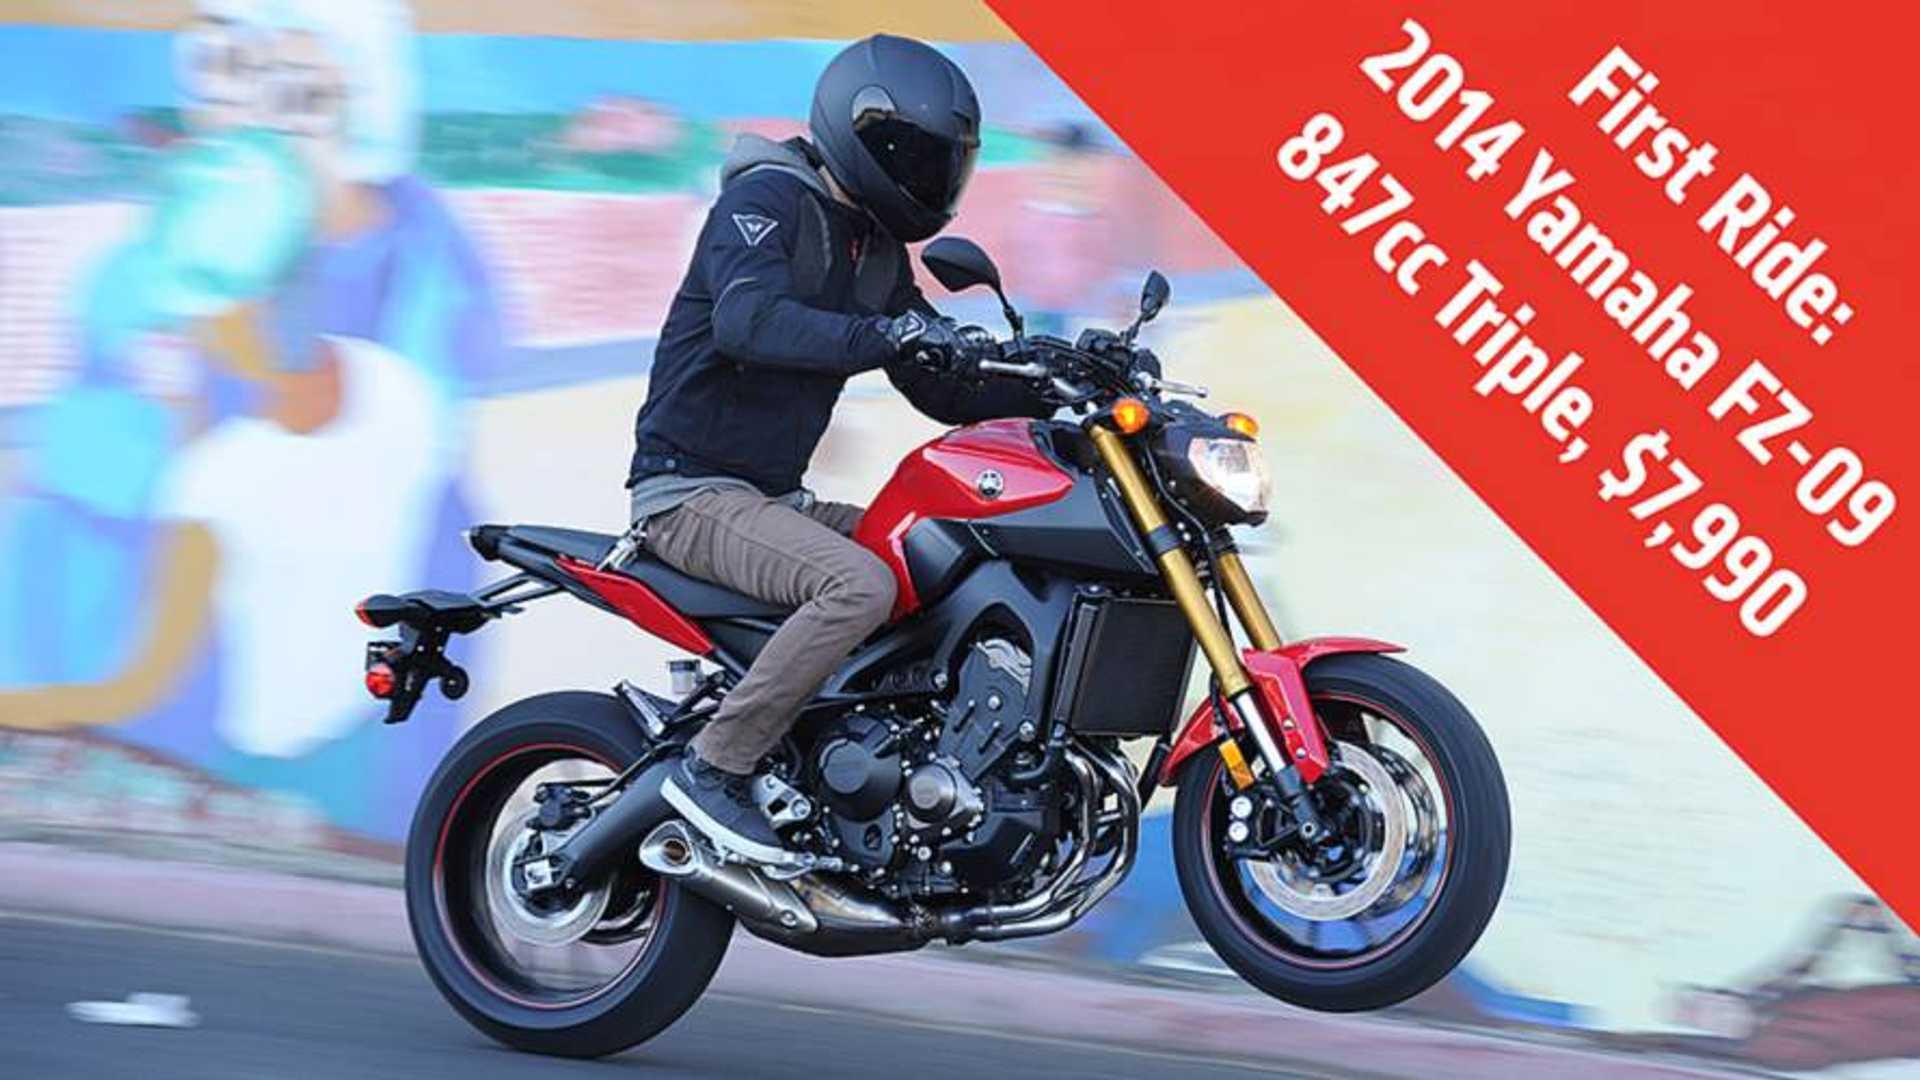 First Ride: 2014 Yamaha FZ-09 Review